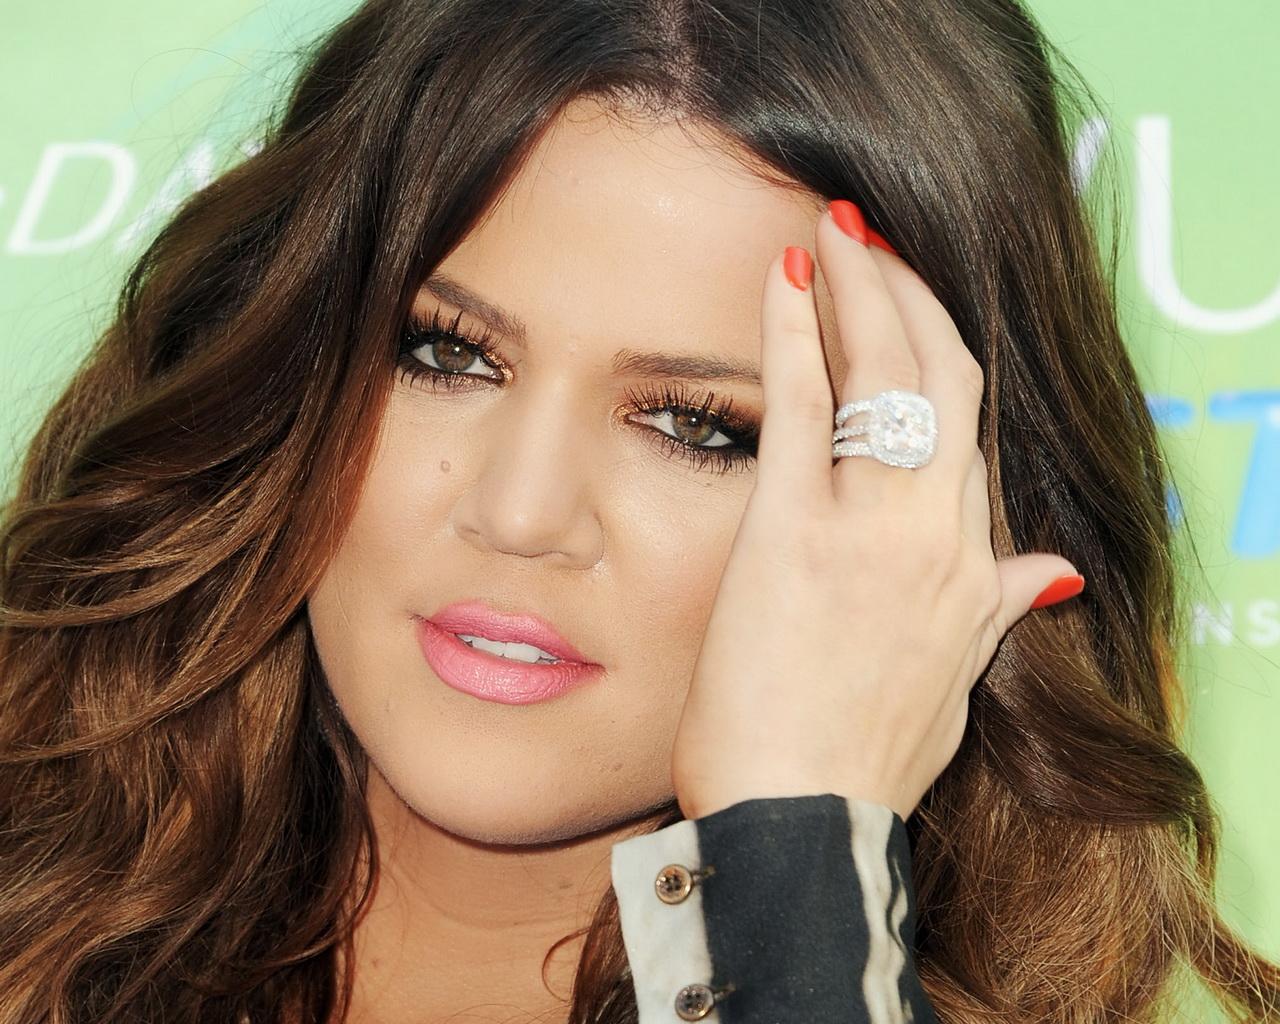 khloe-kardashian-diamond-ring-5